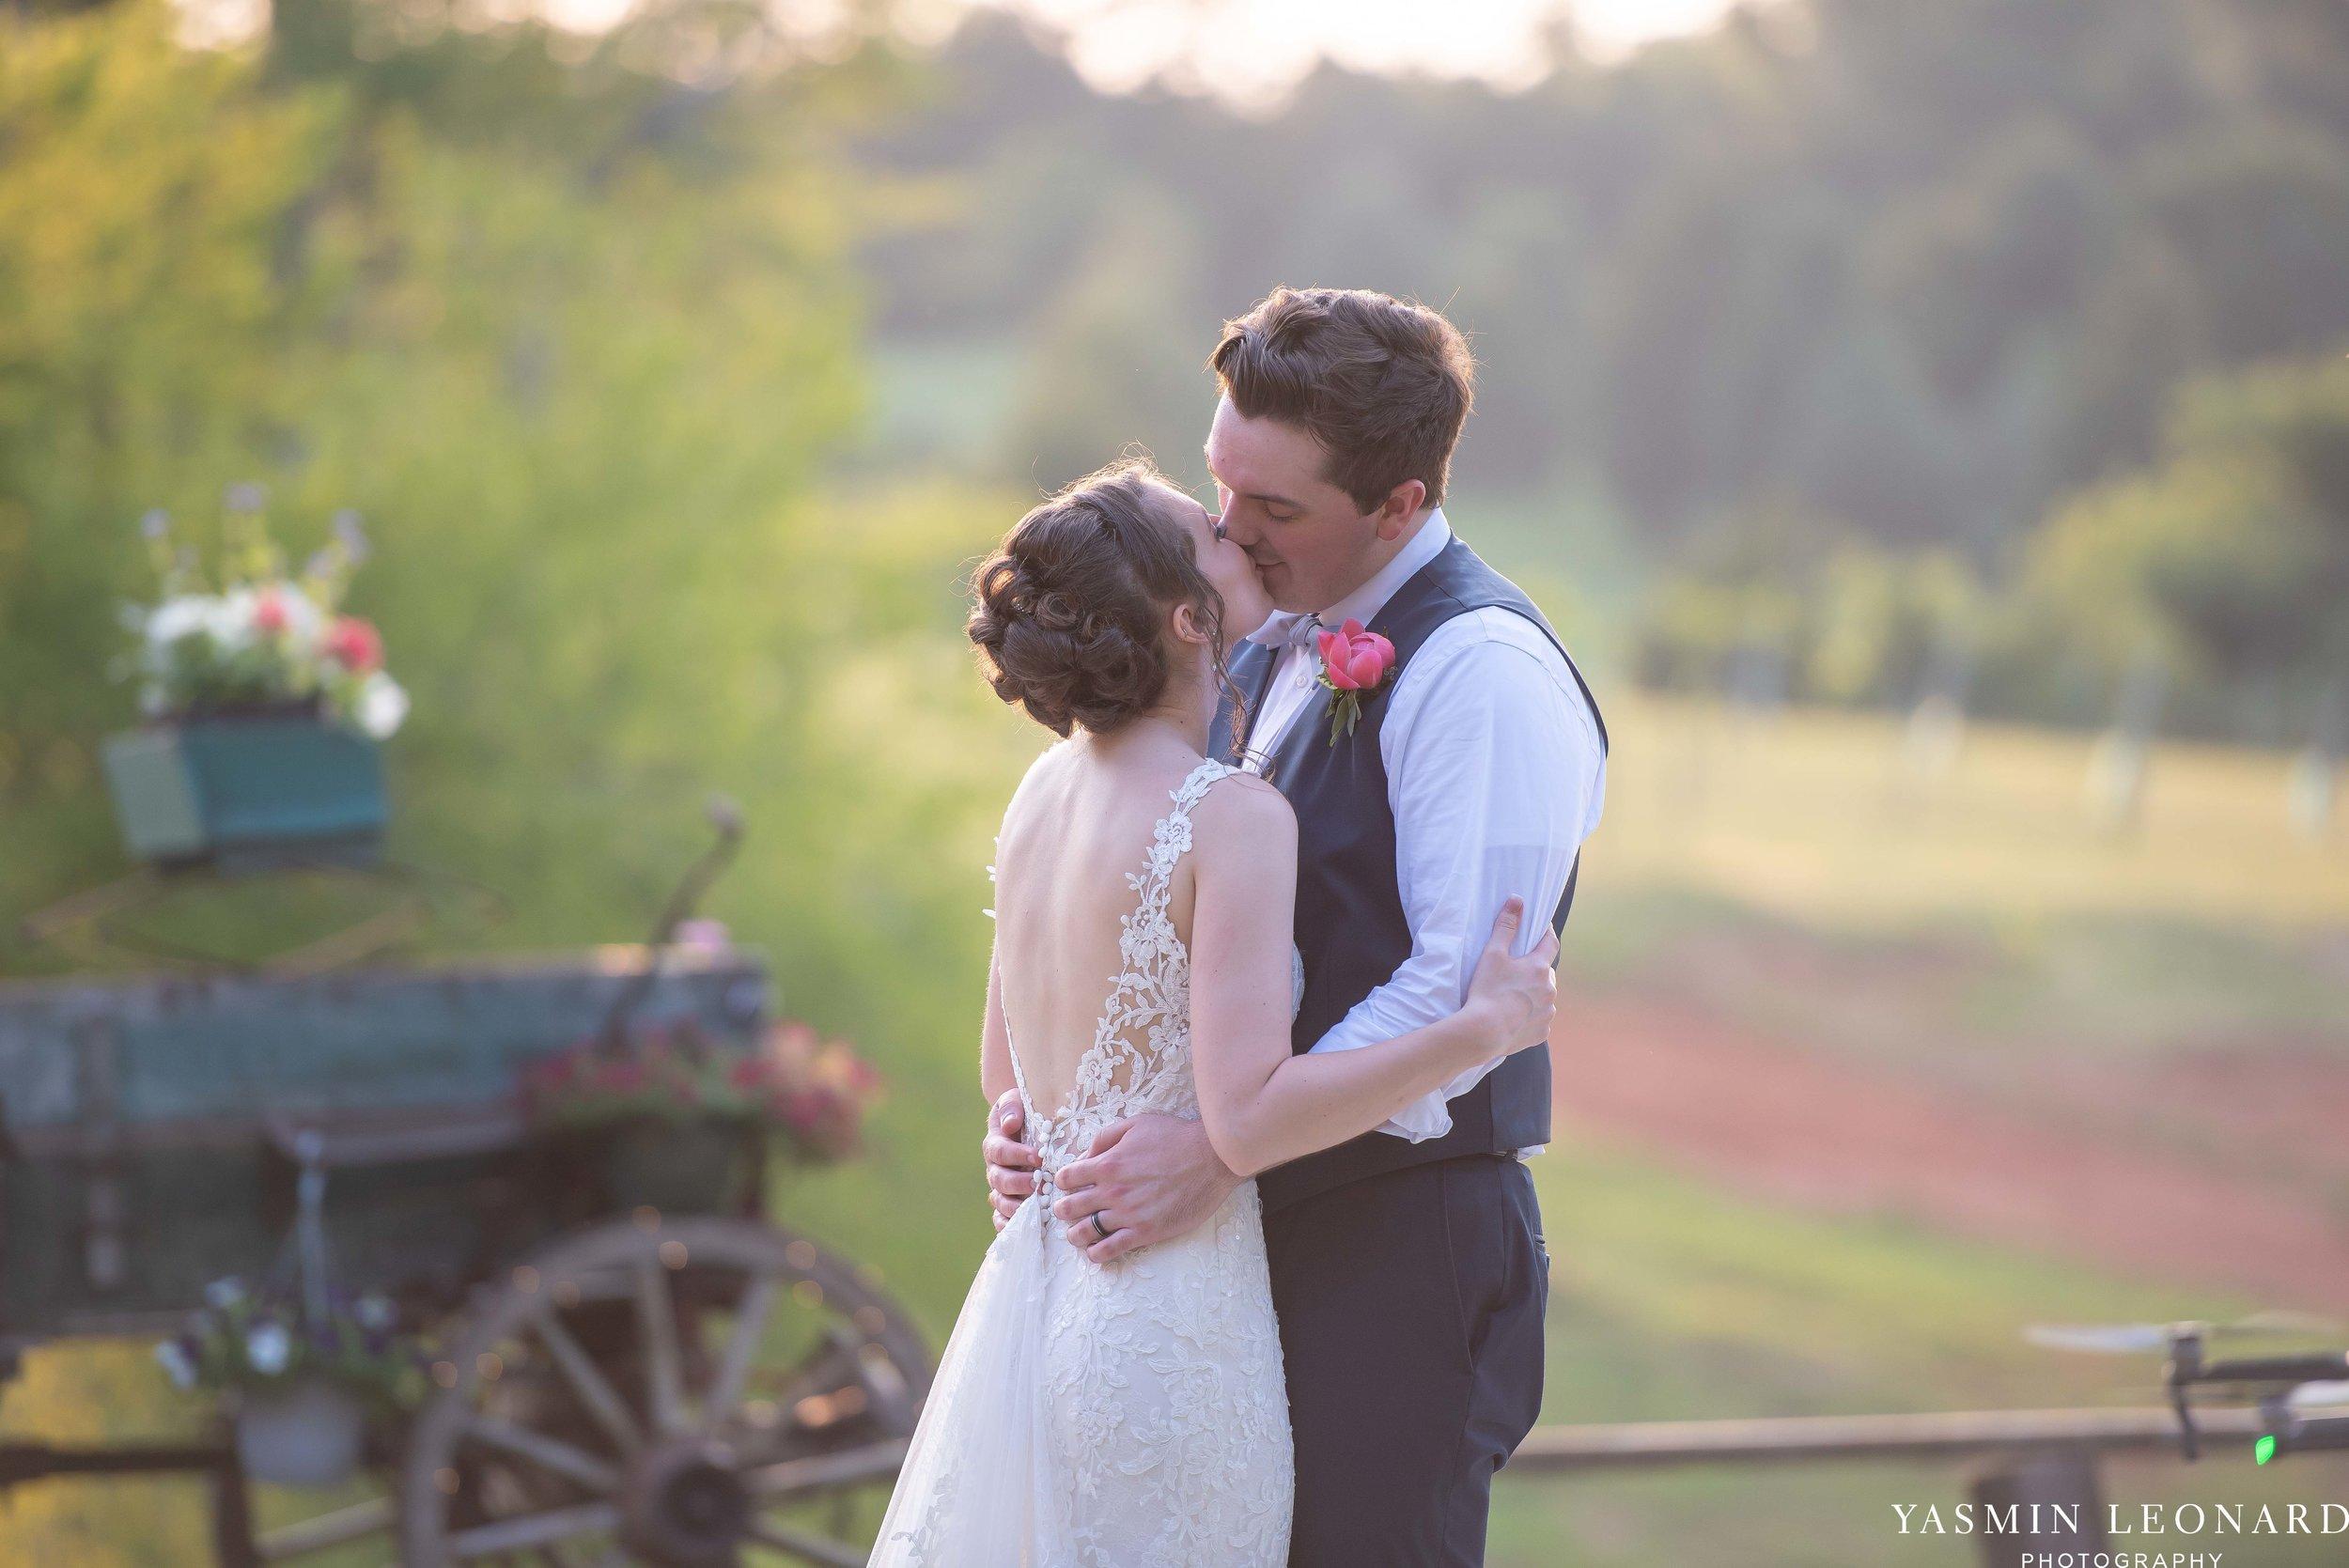 Old Homeplace Vineyard - NC Weddings - Outdoor Summer Weddings - Peony Boutique - Vineyard Wedding - NC Photographer - Yasmin Leonard Photography-60.jpg